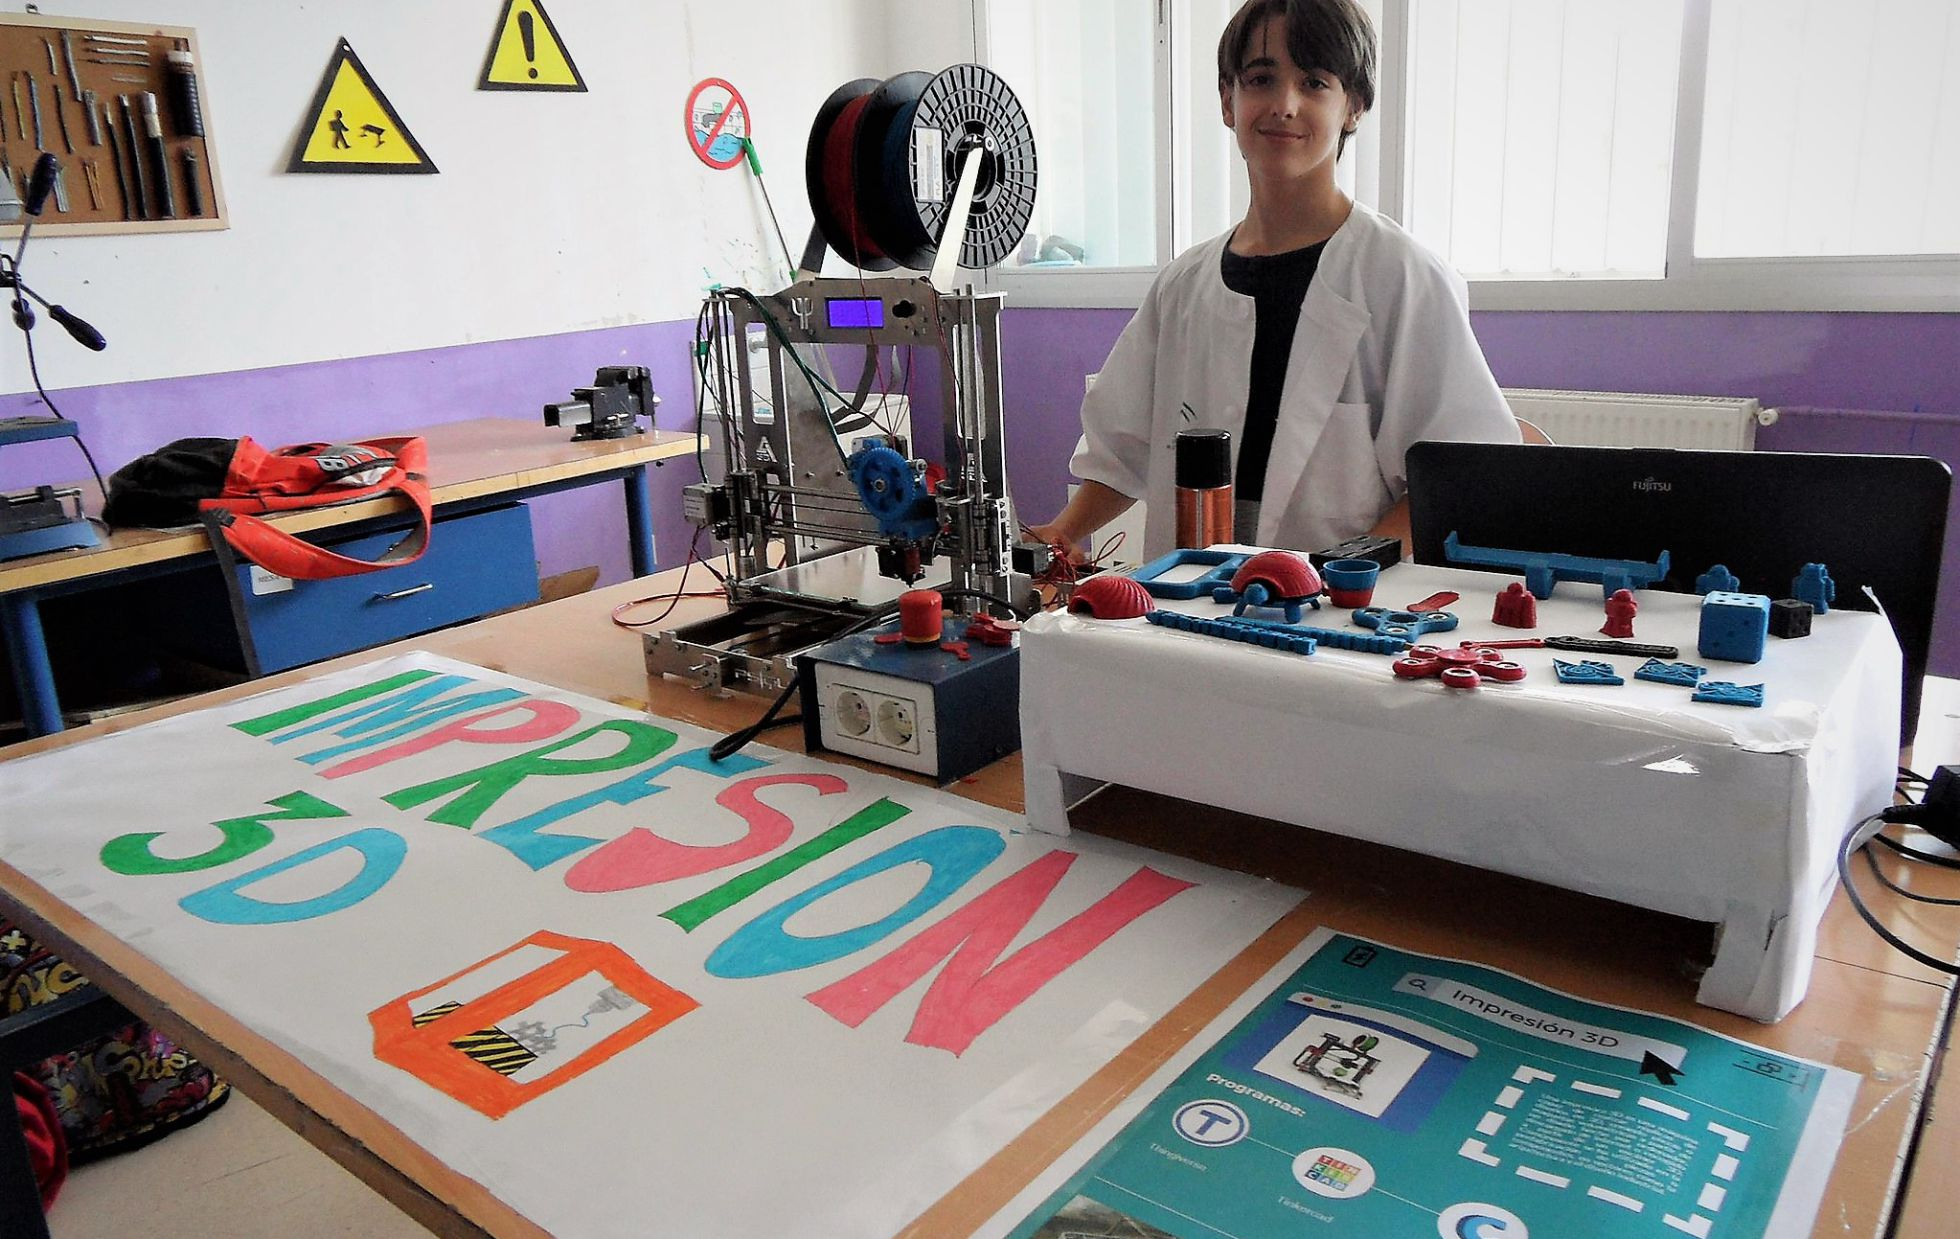 Taller 'Futuro y tecnología' | Mª EUGENIA PÉREZ, IES 'ÍTACA'